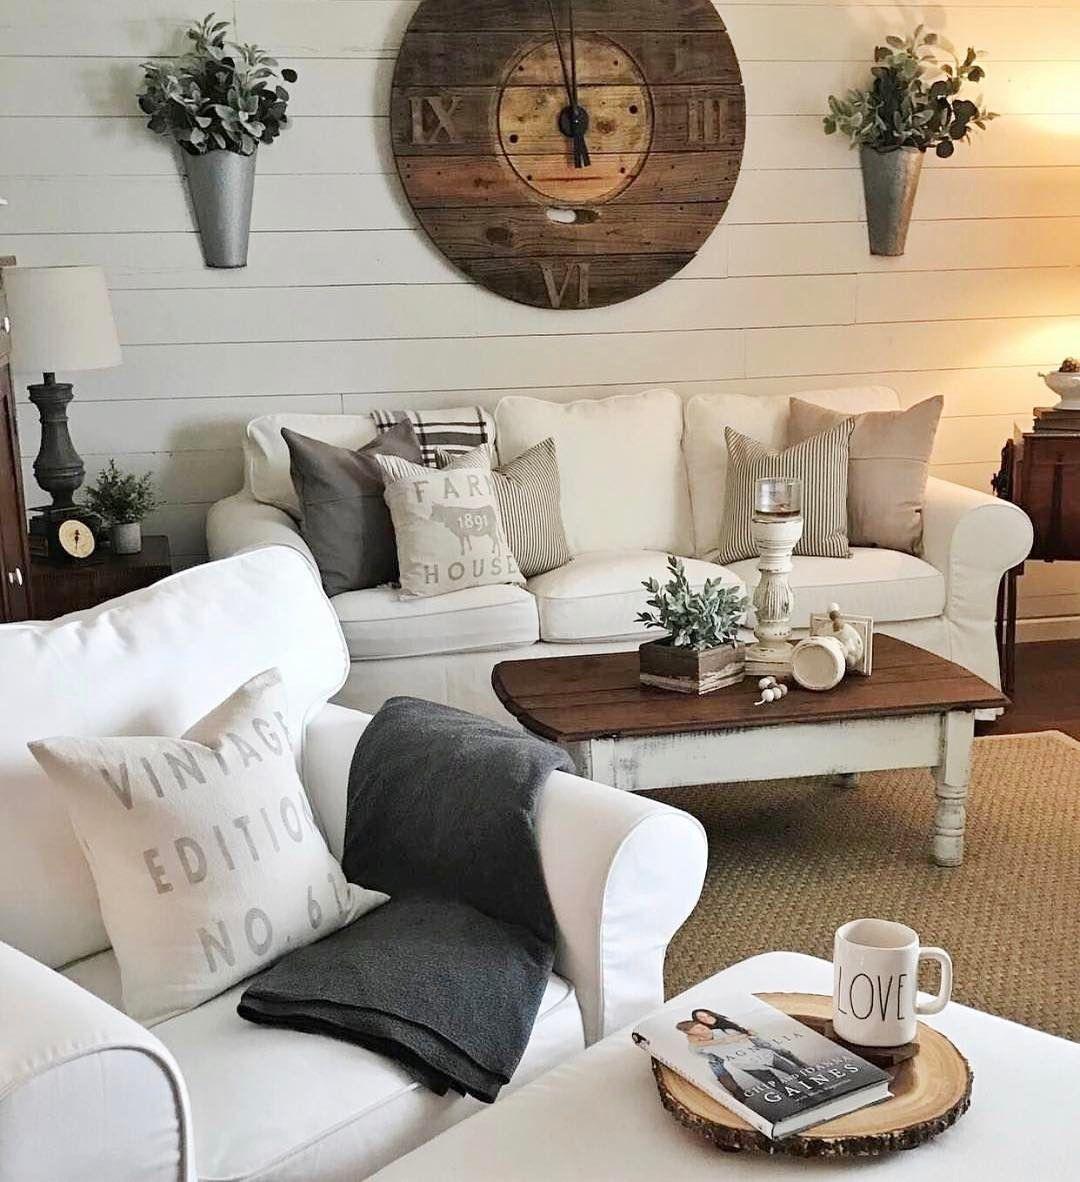 Pin de sara hern ndez en hogar pinterest decoraci n hogar hogar y cuartos - Pinterest decoracion hogar ...